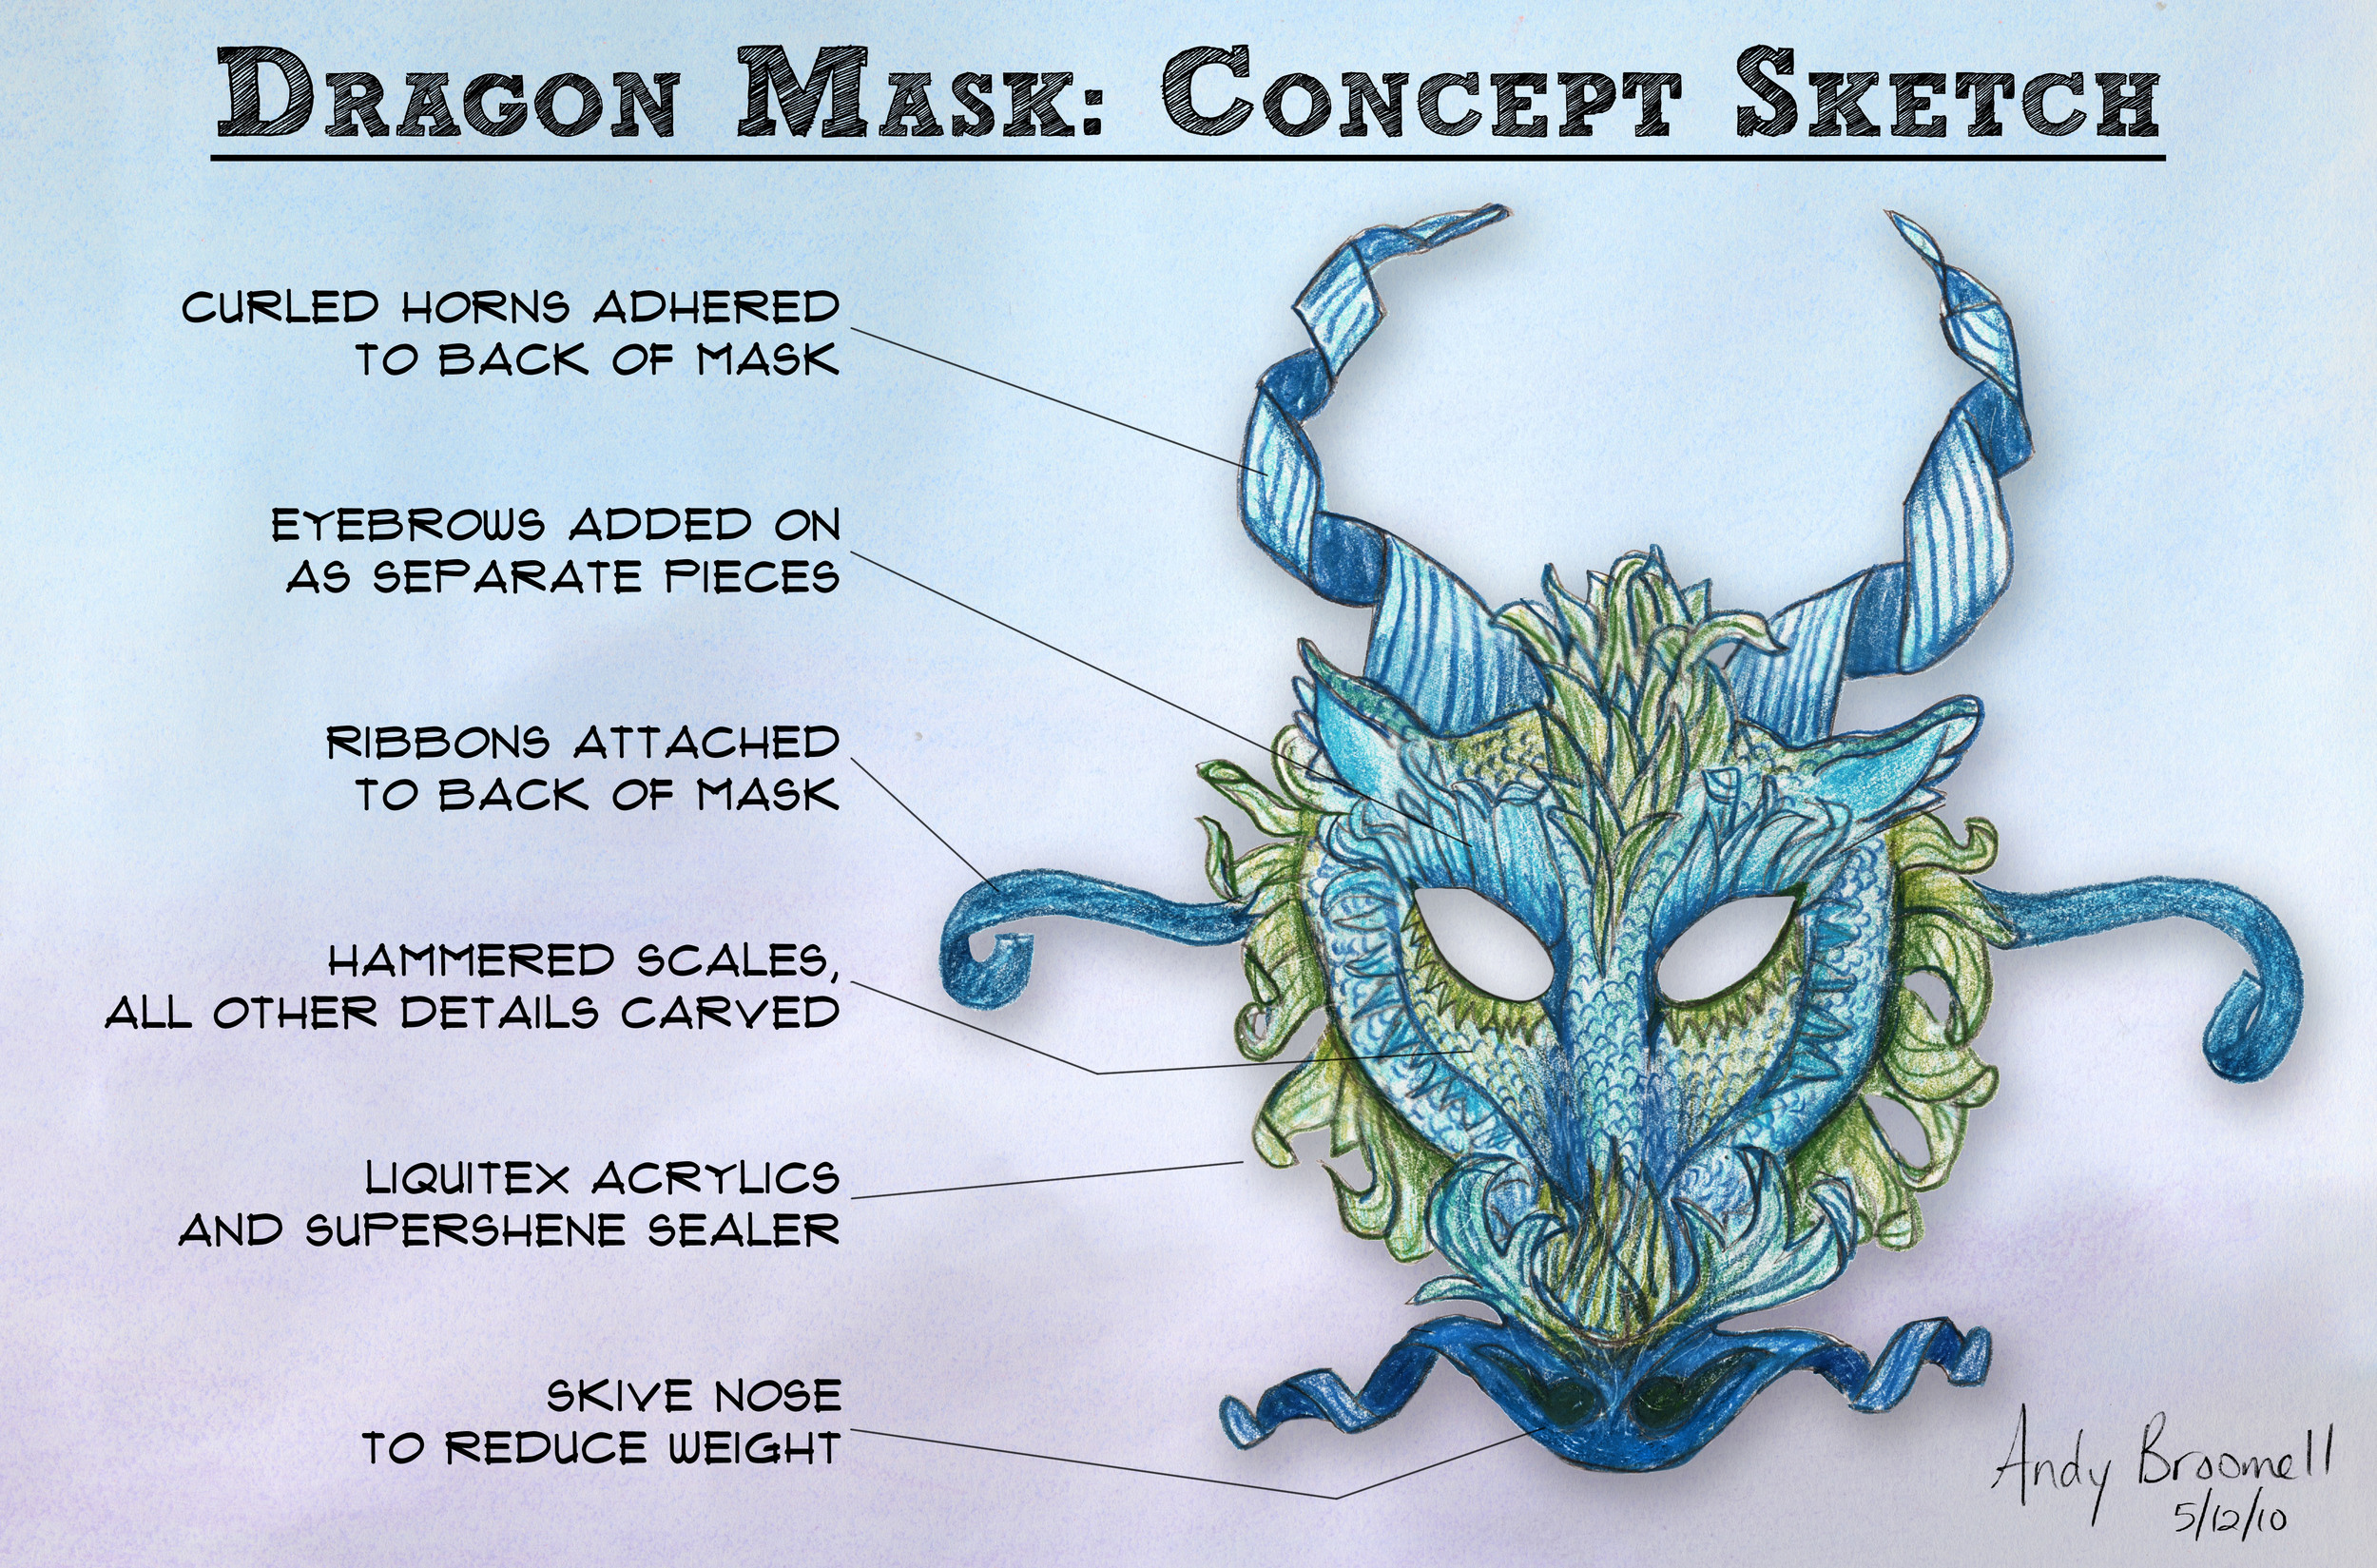 dragon-mask-sketch-andy-broomell.jpg